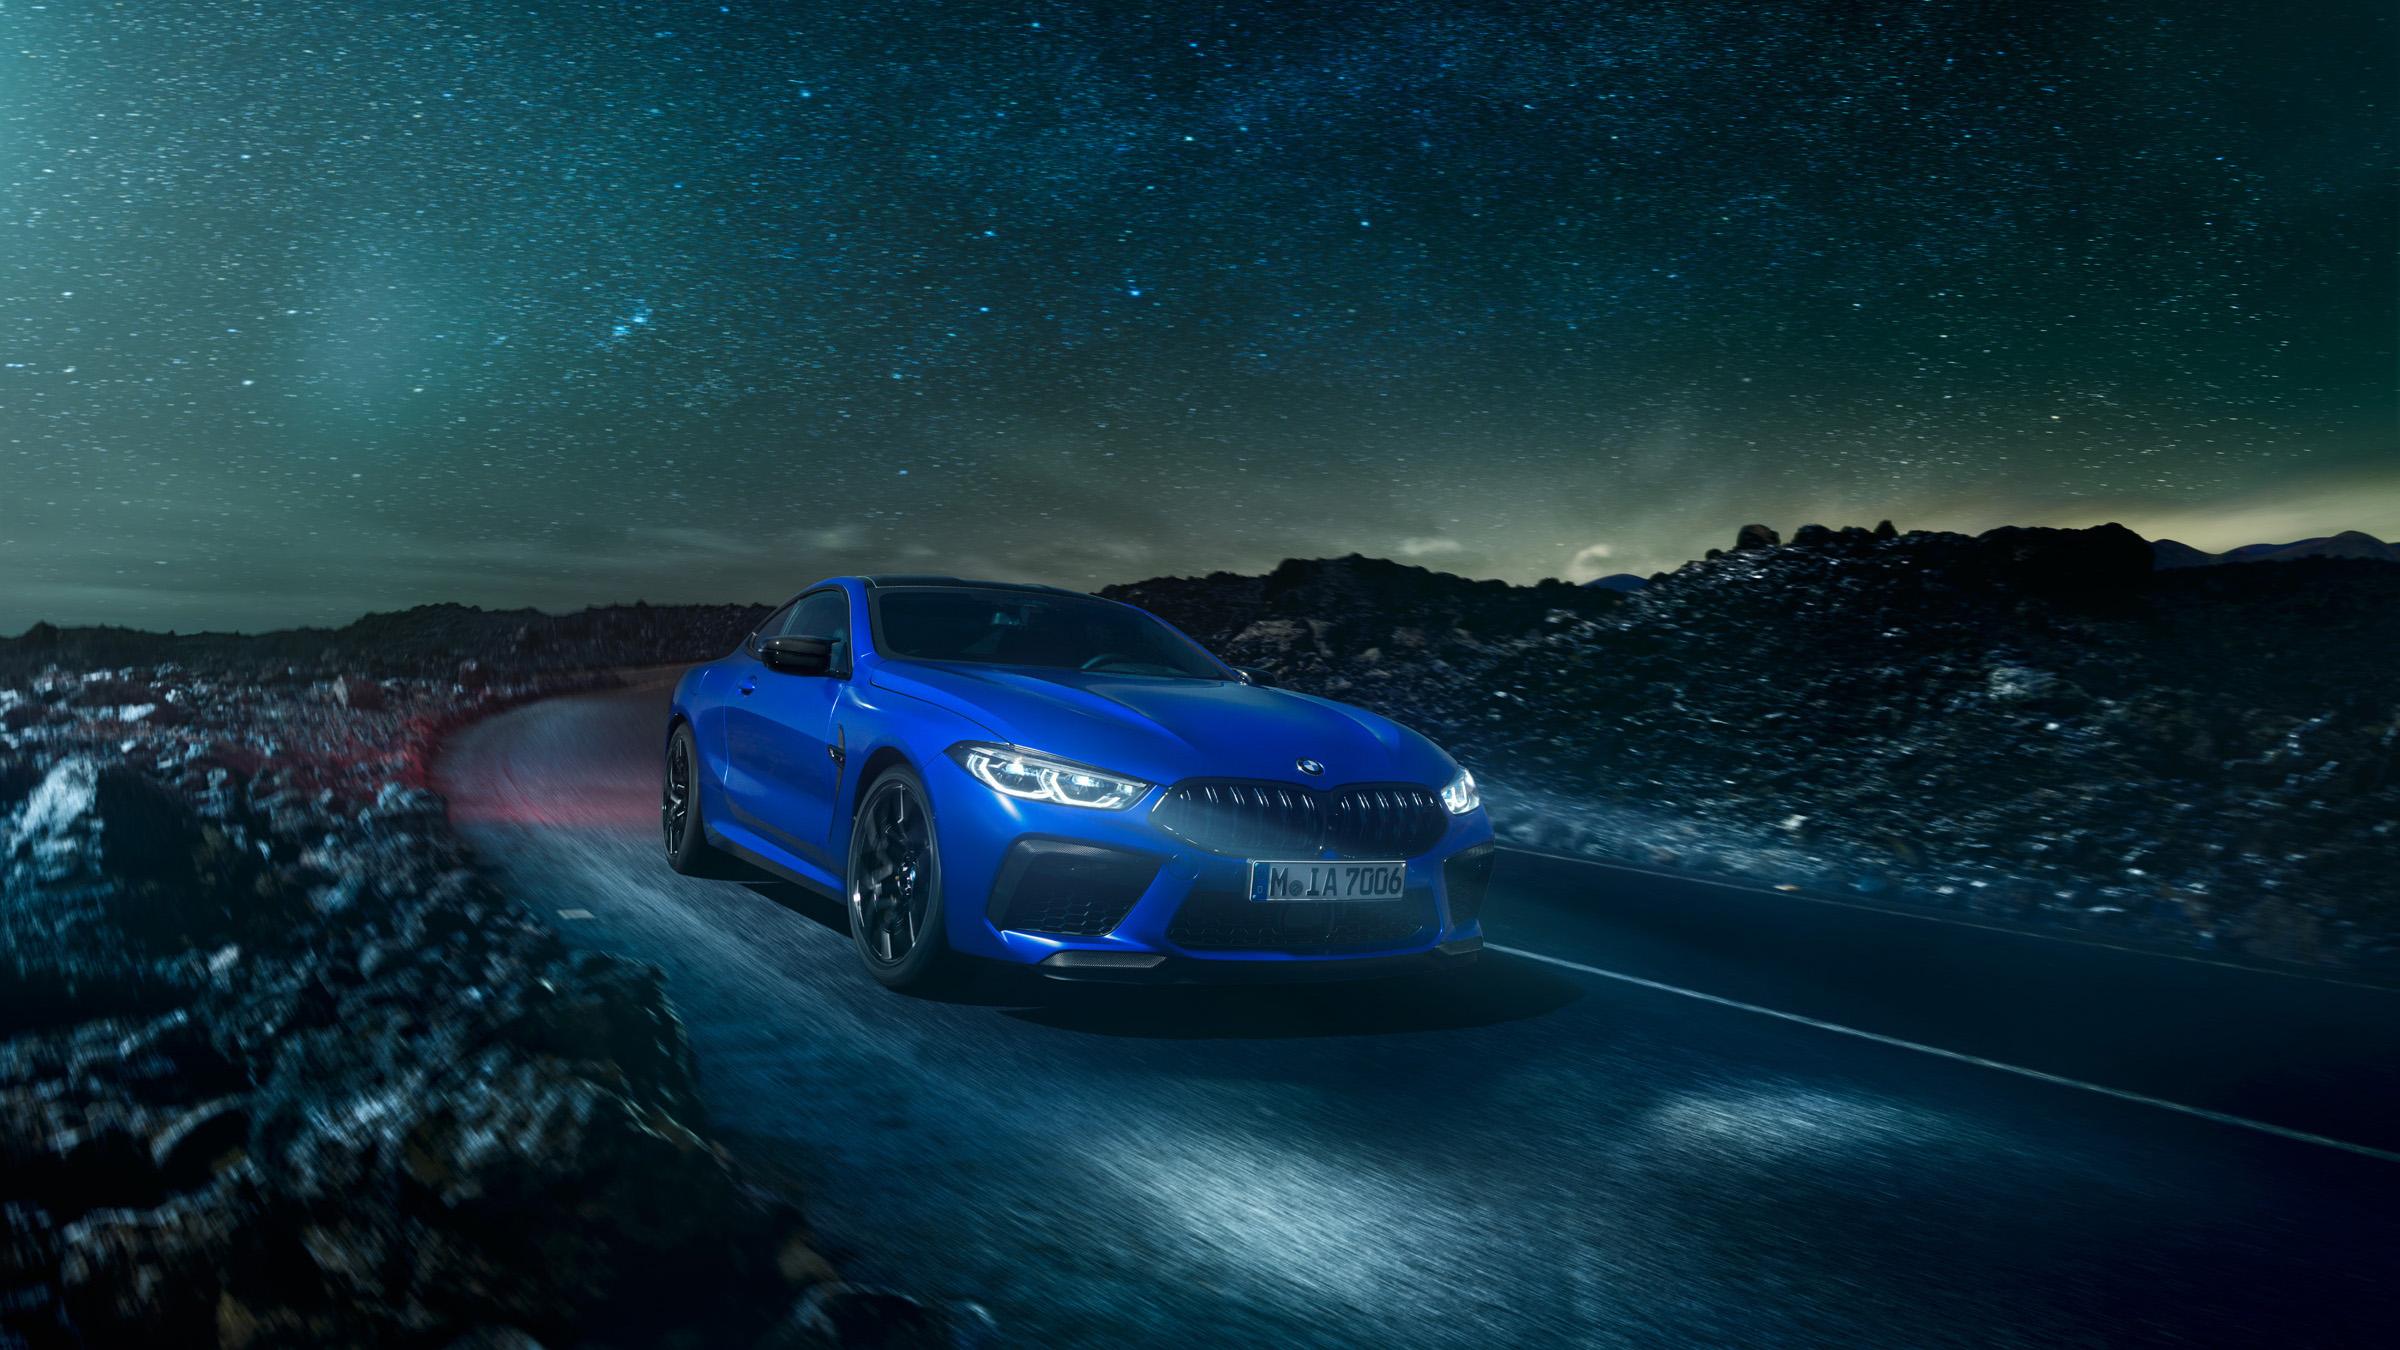 BMW_M8_COUPE_KONRAD_SCHMIDT_01_2400x1350